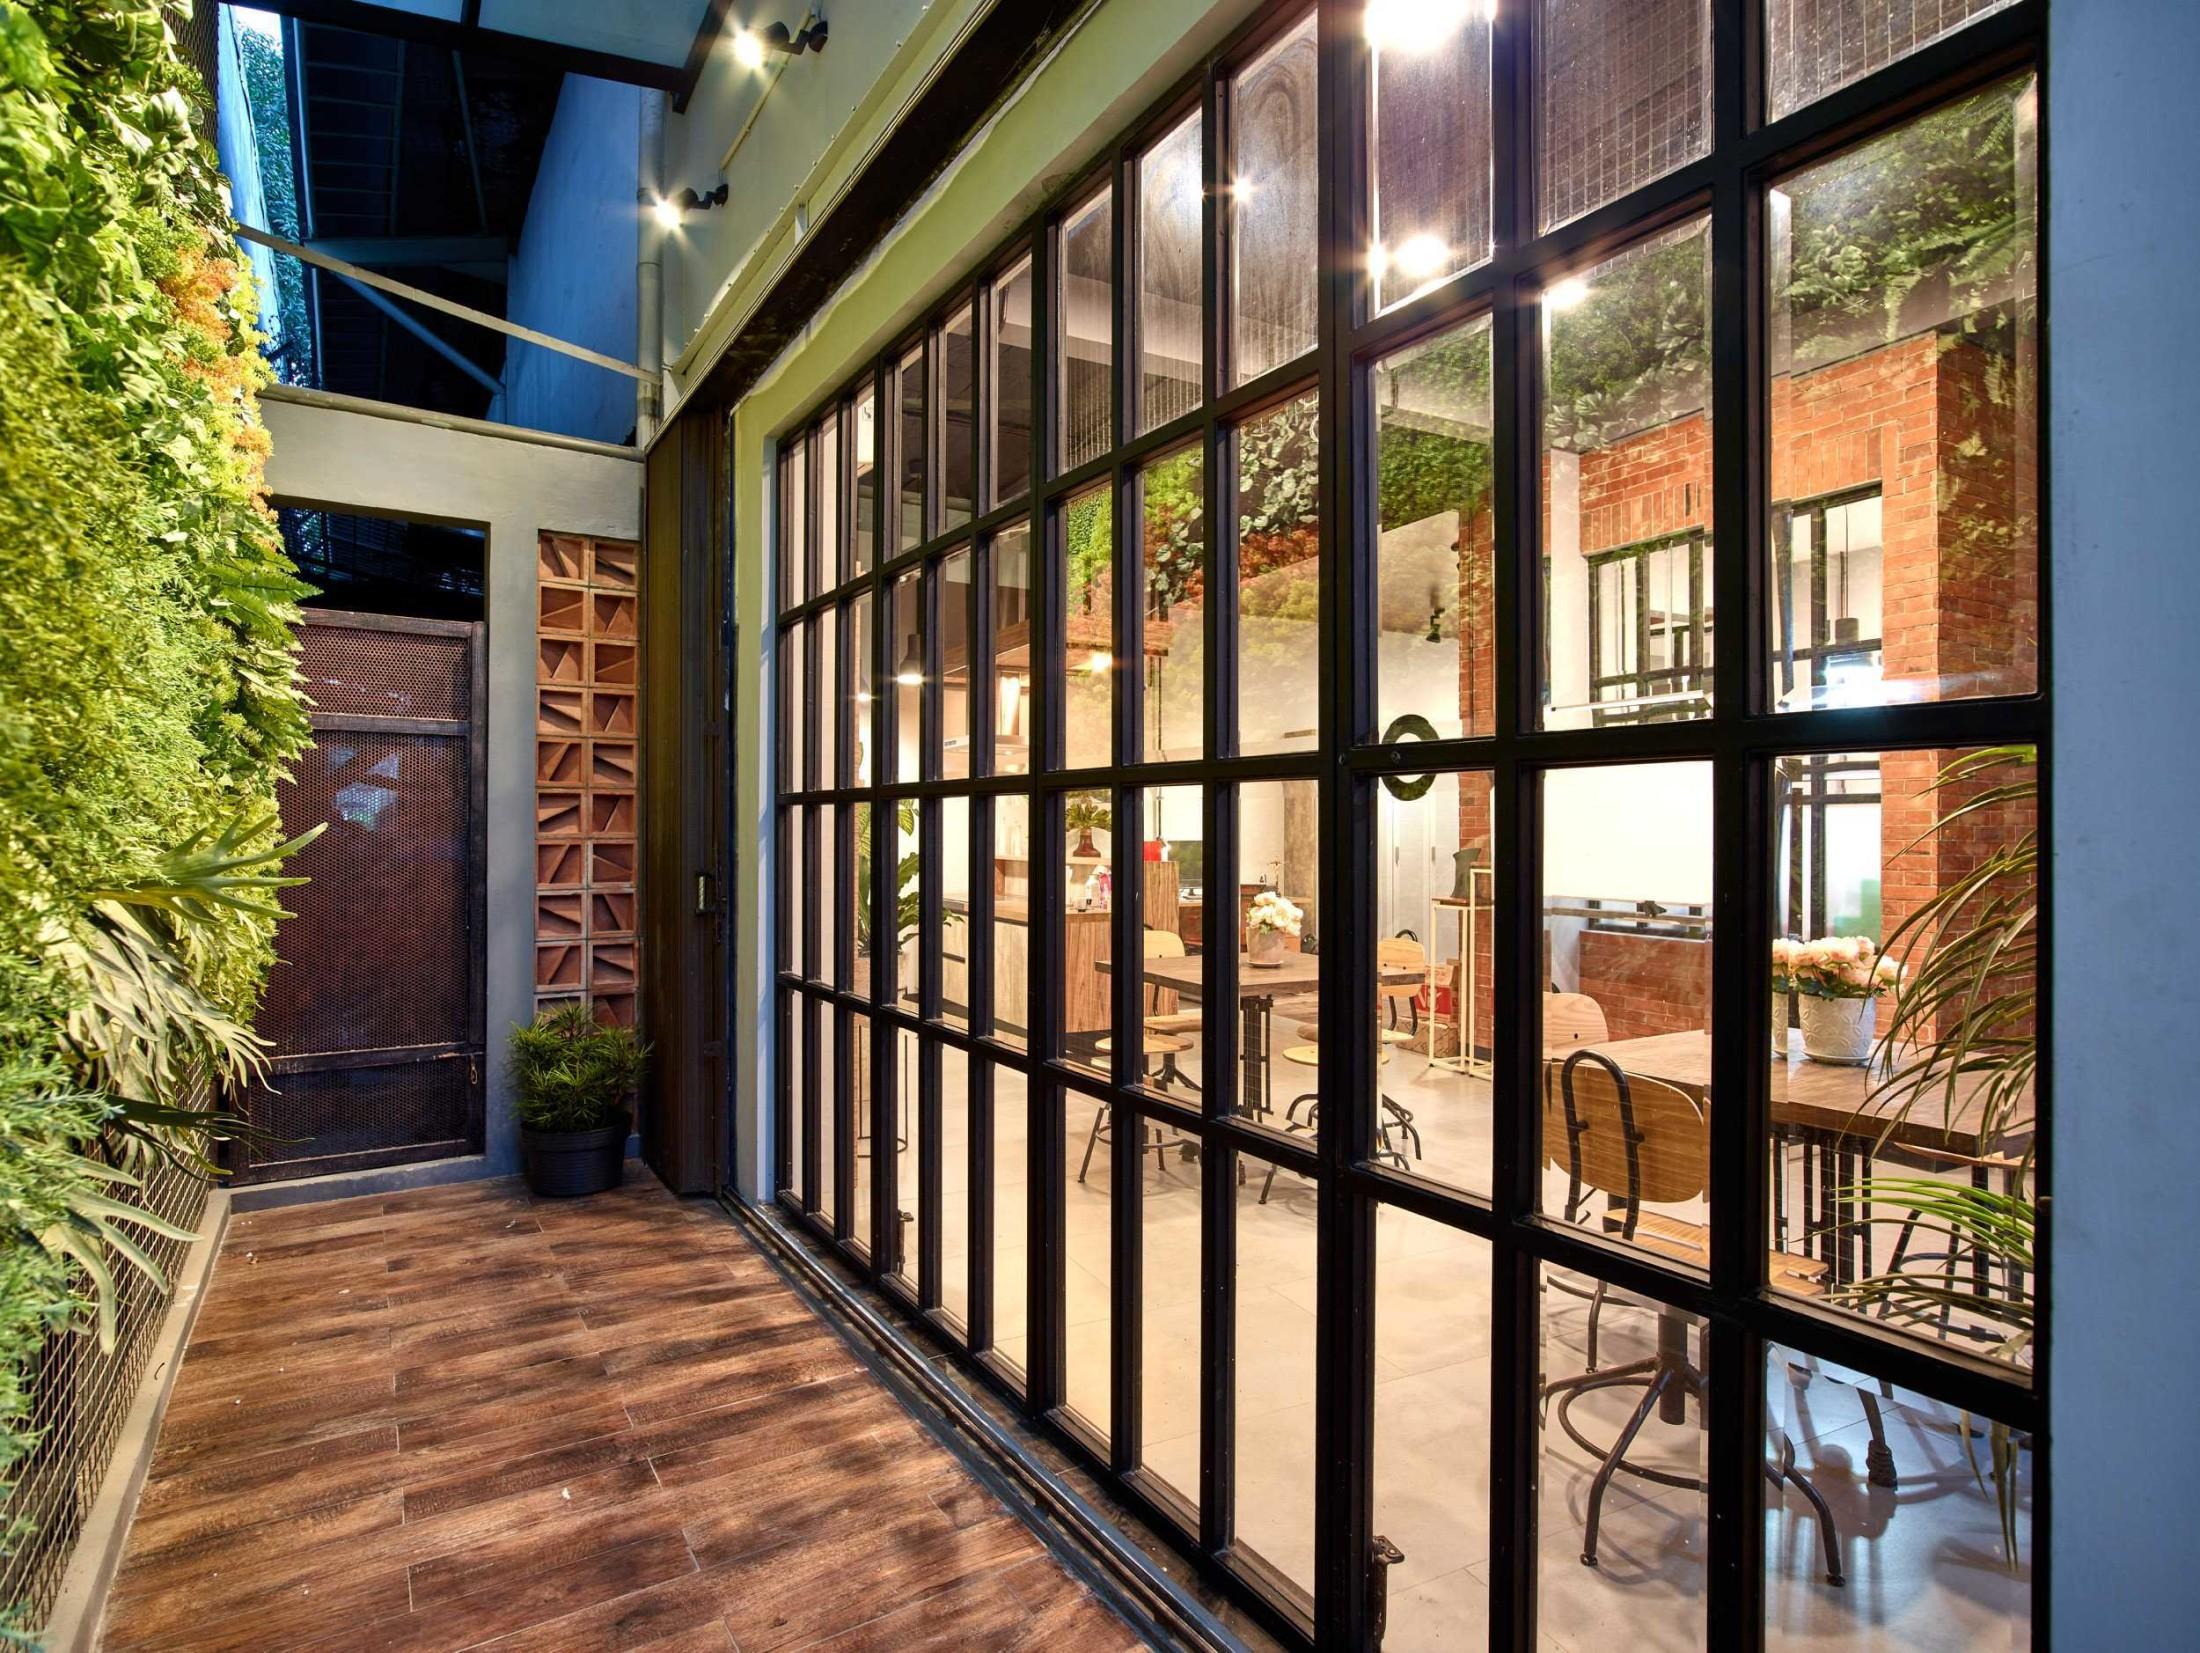 Fixed window bergaya glazing juga berperan sebagai dinding kaca Cirangrang Bandung Office karya Dinardithen Studio (Sumber: arsitag.com)